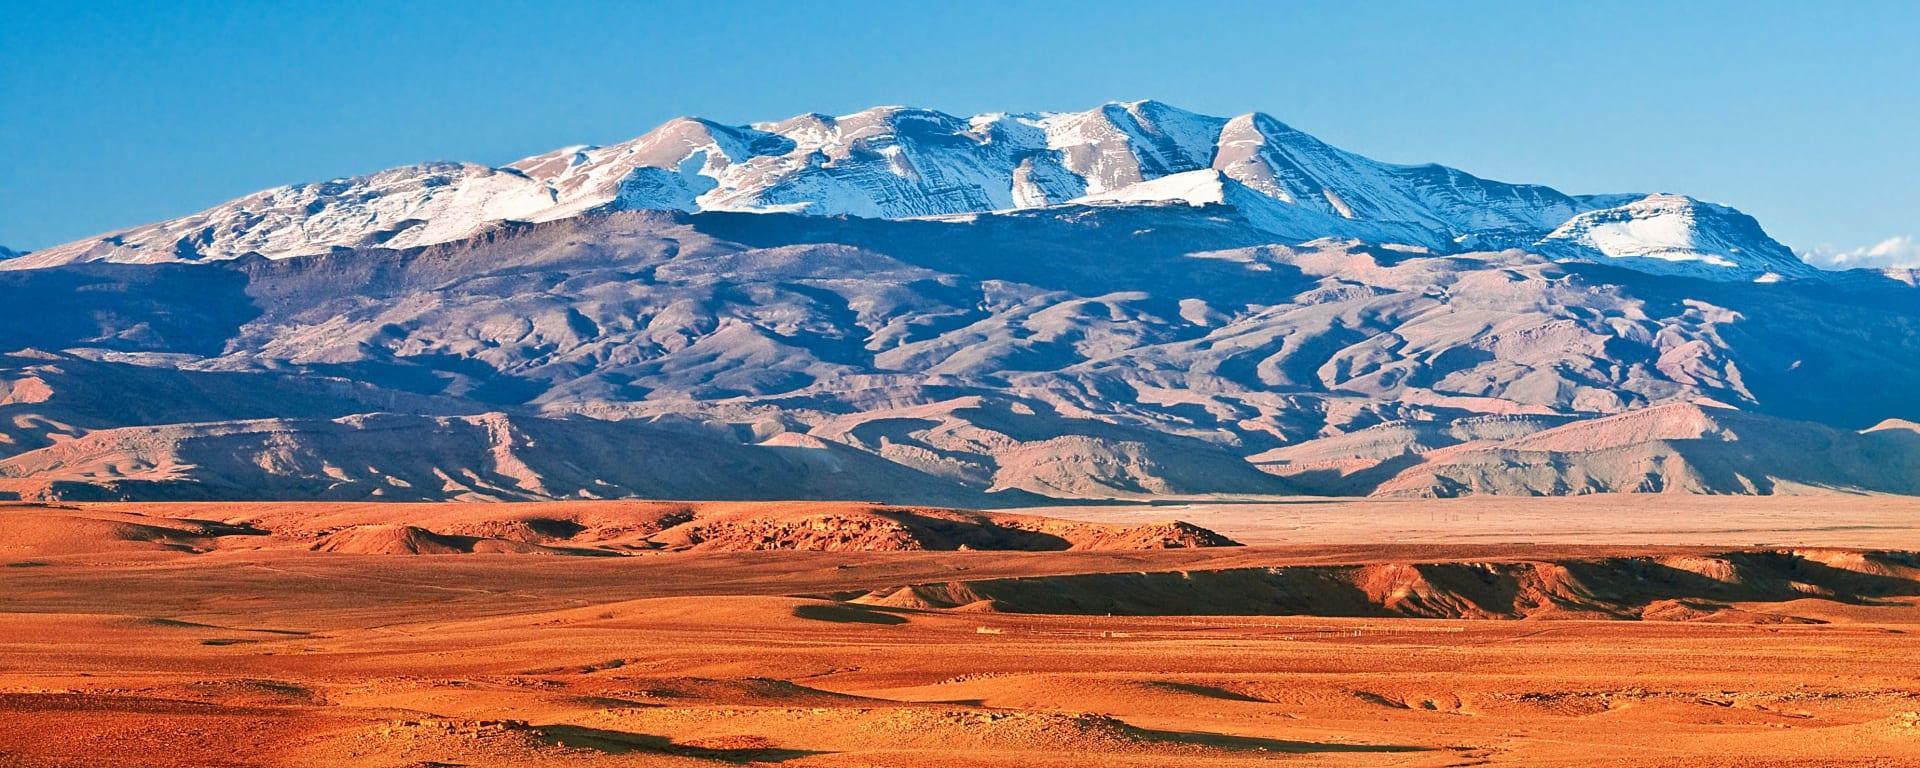 Soft Adventure Atlasgebirge ab Marrakesch: Marokko Atlas Gebirge